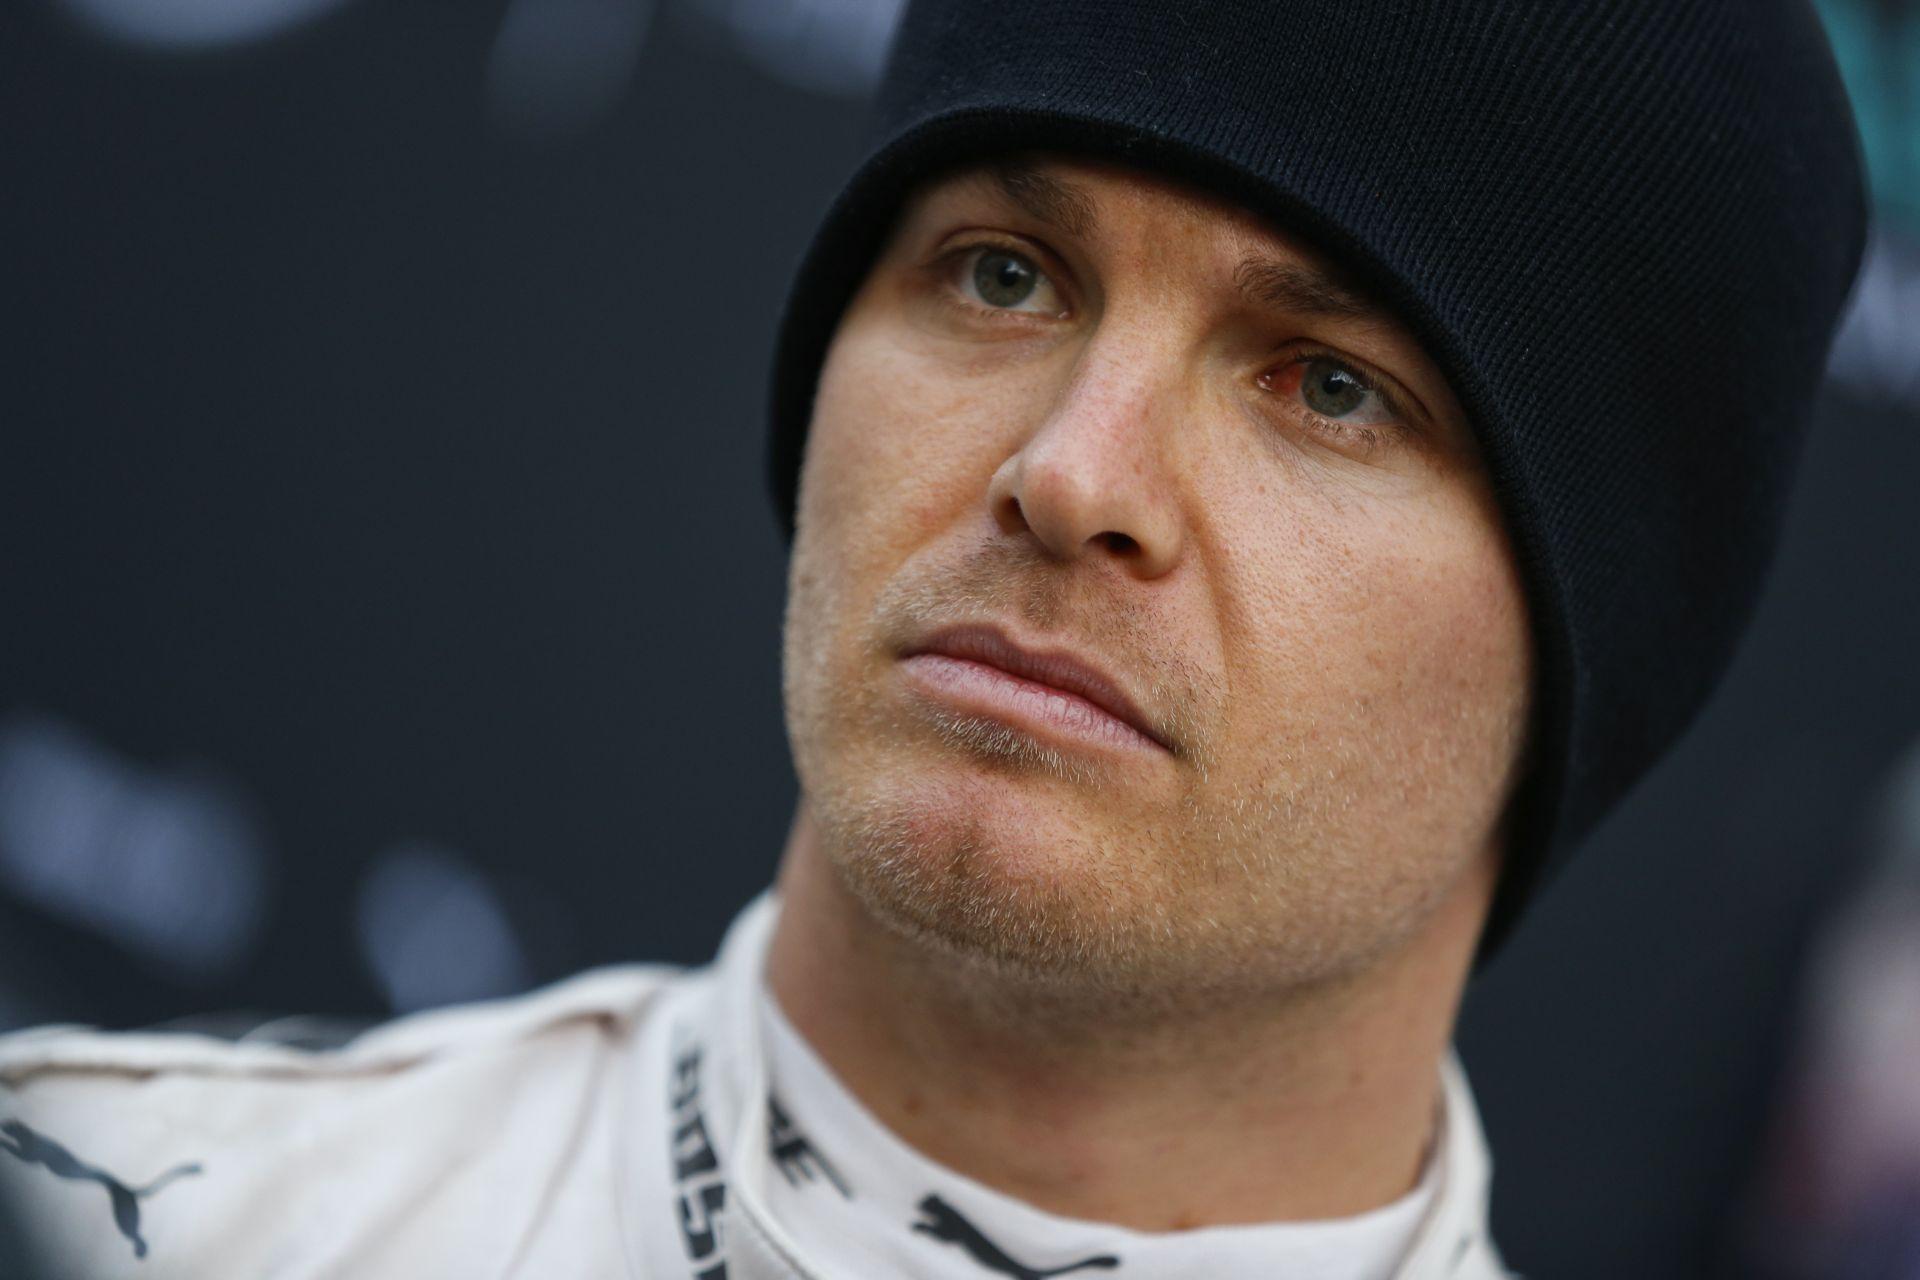 Buttonhoz hasonlóan Rosberg is tudja, hol kell biciklizni!